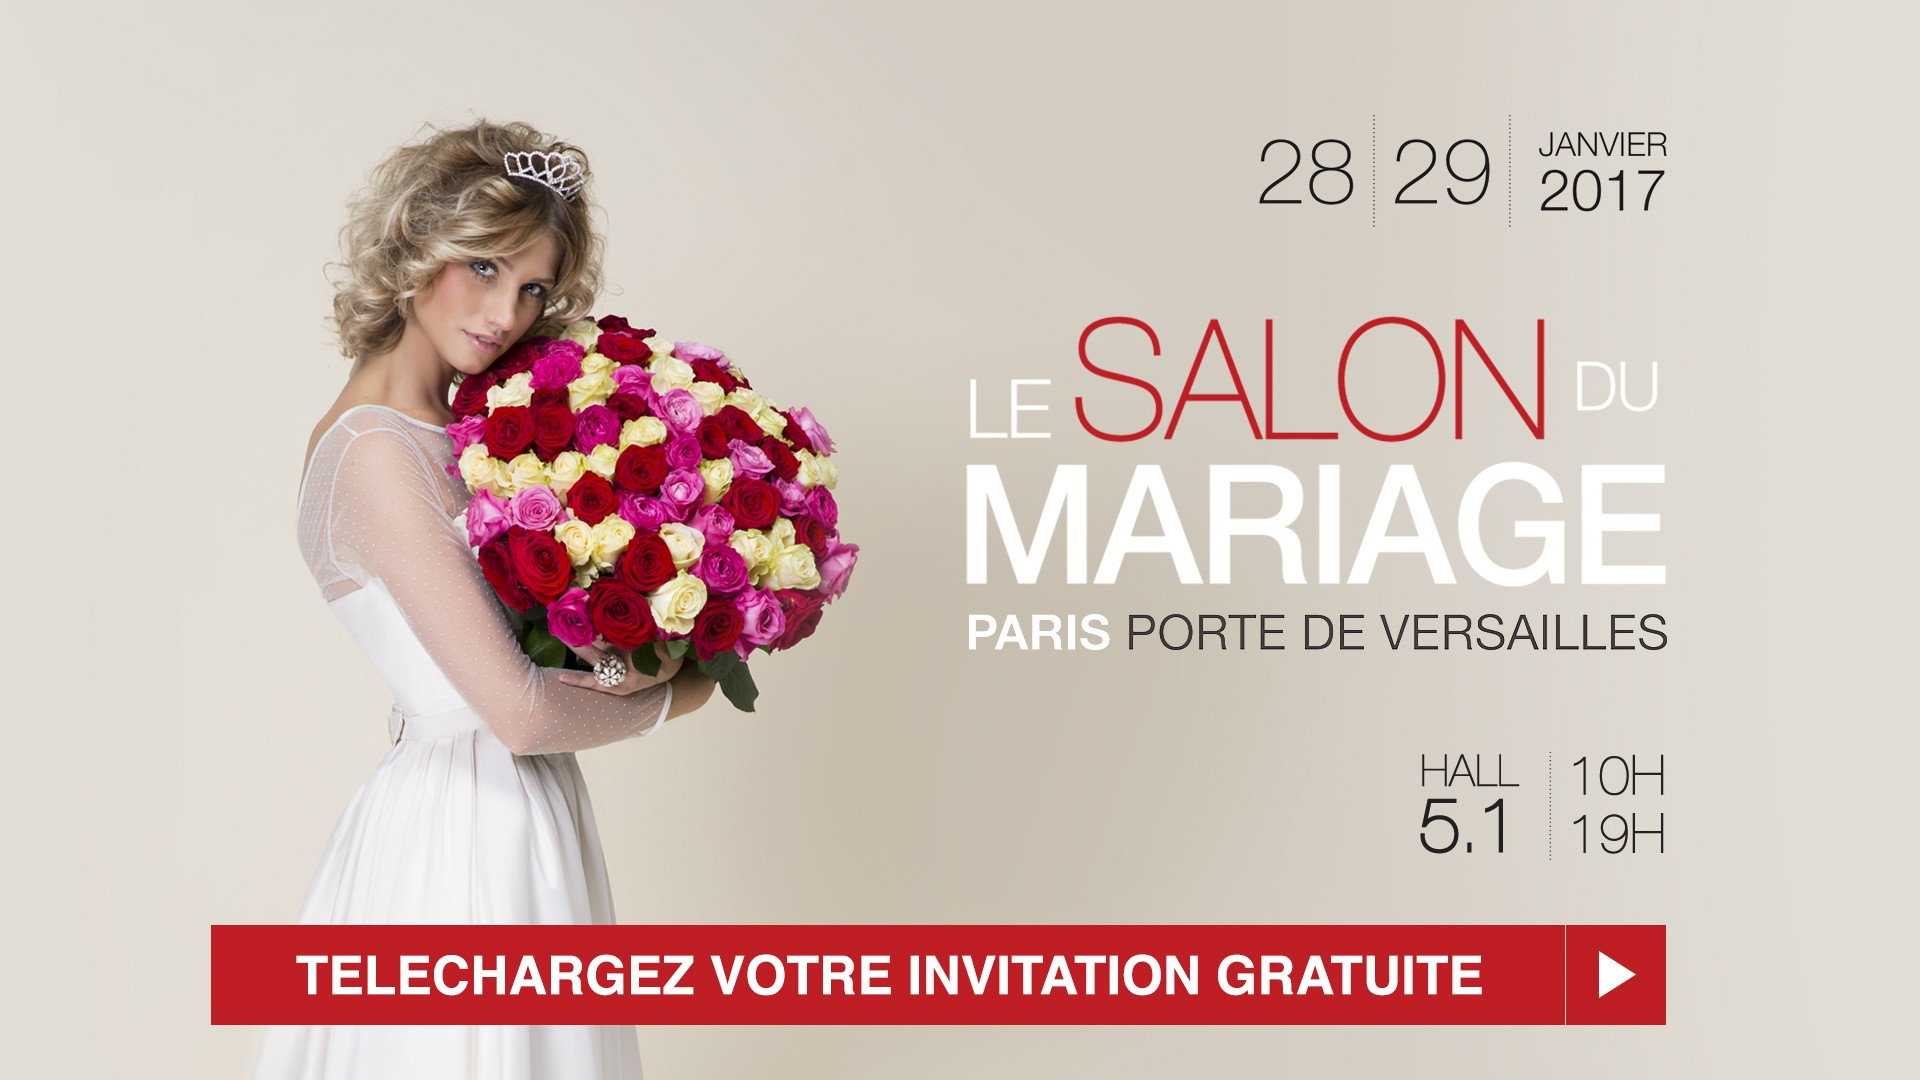 Tylekina bijoux de cr ateur for Porte de versailles salon mariage